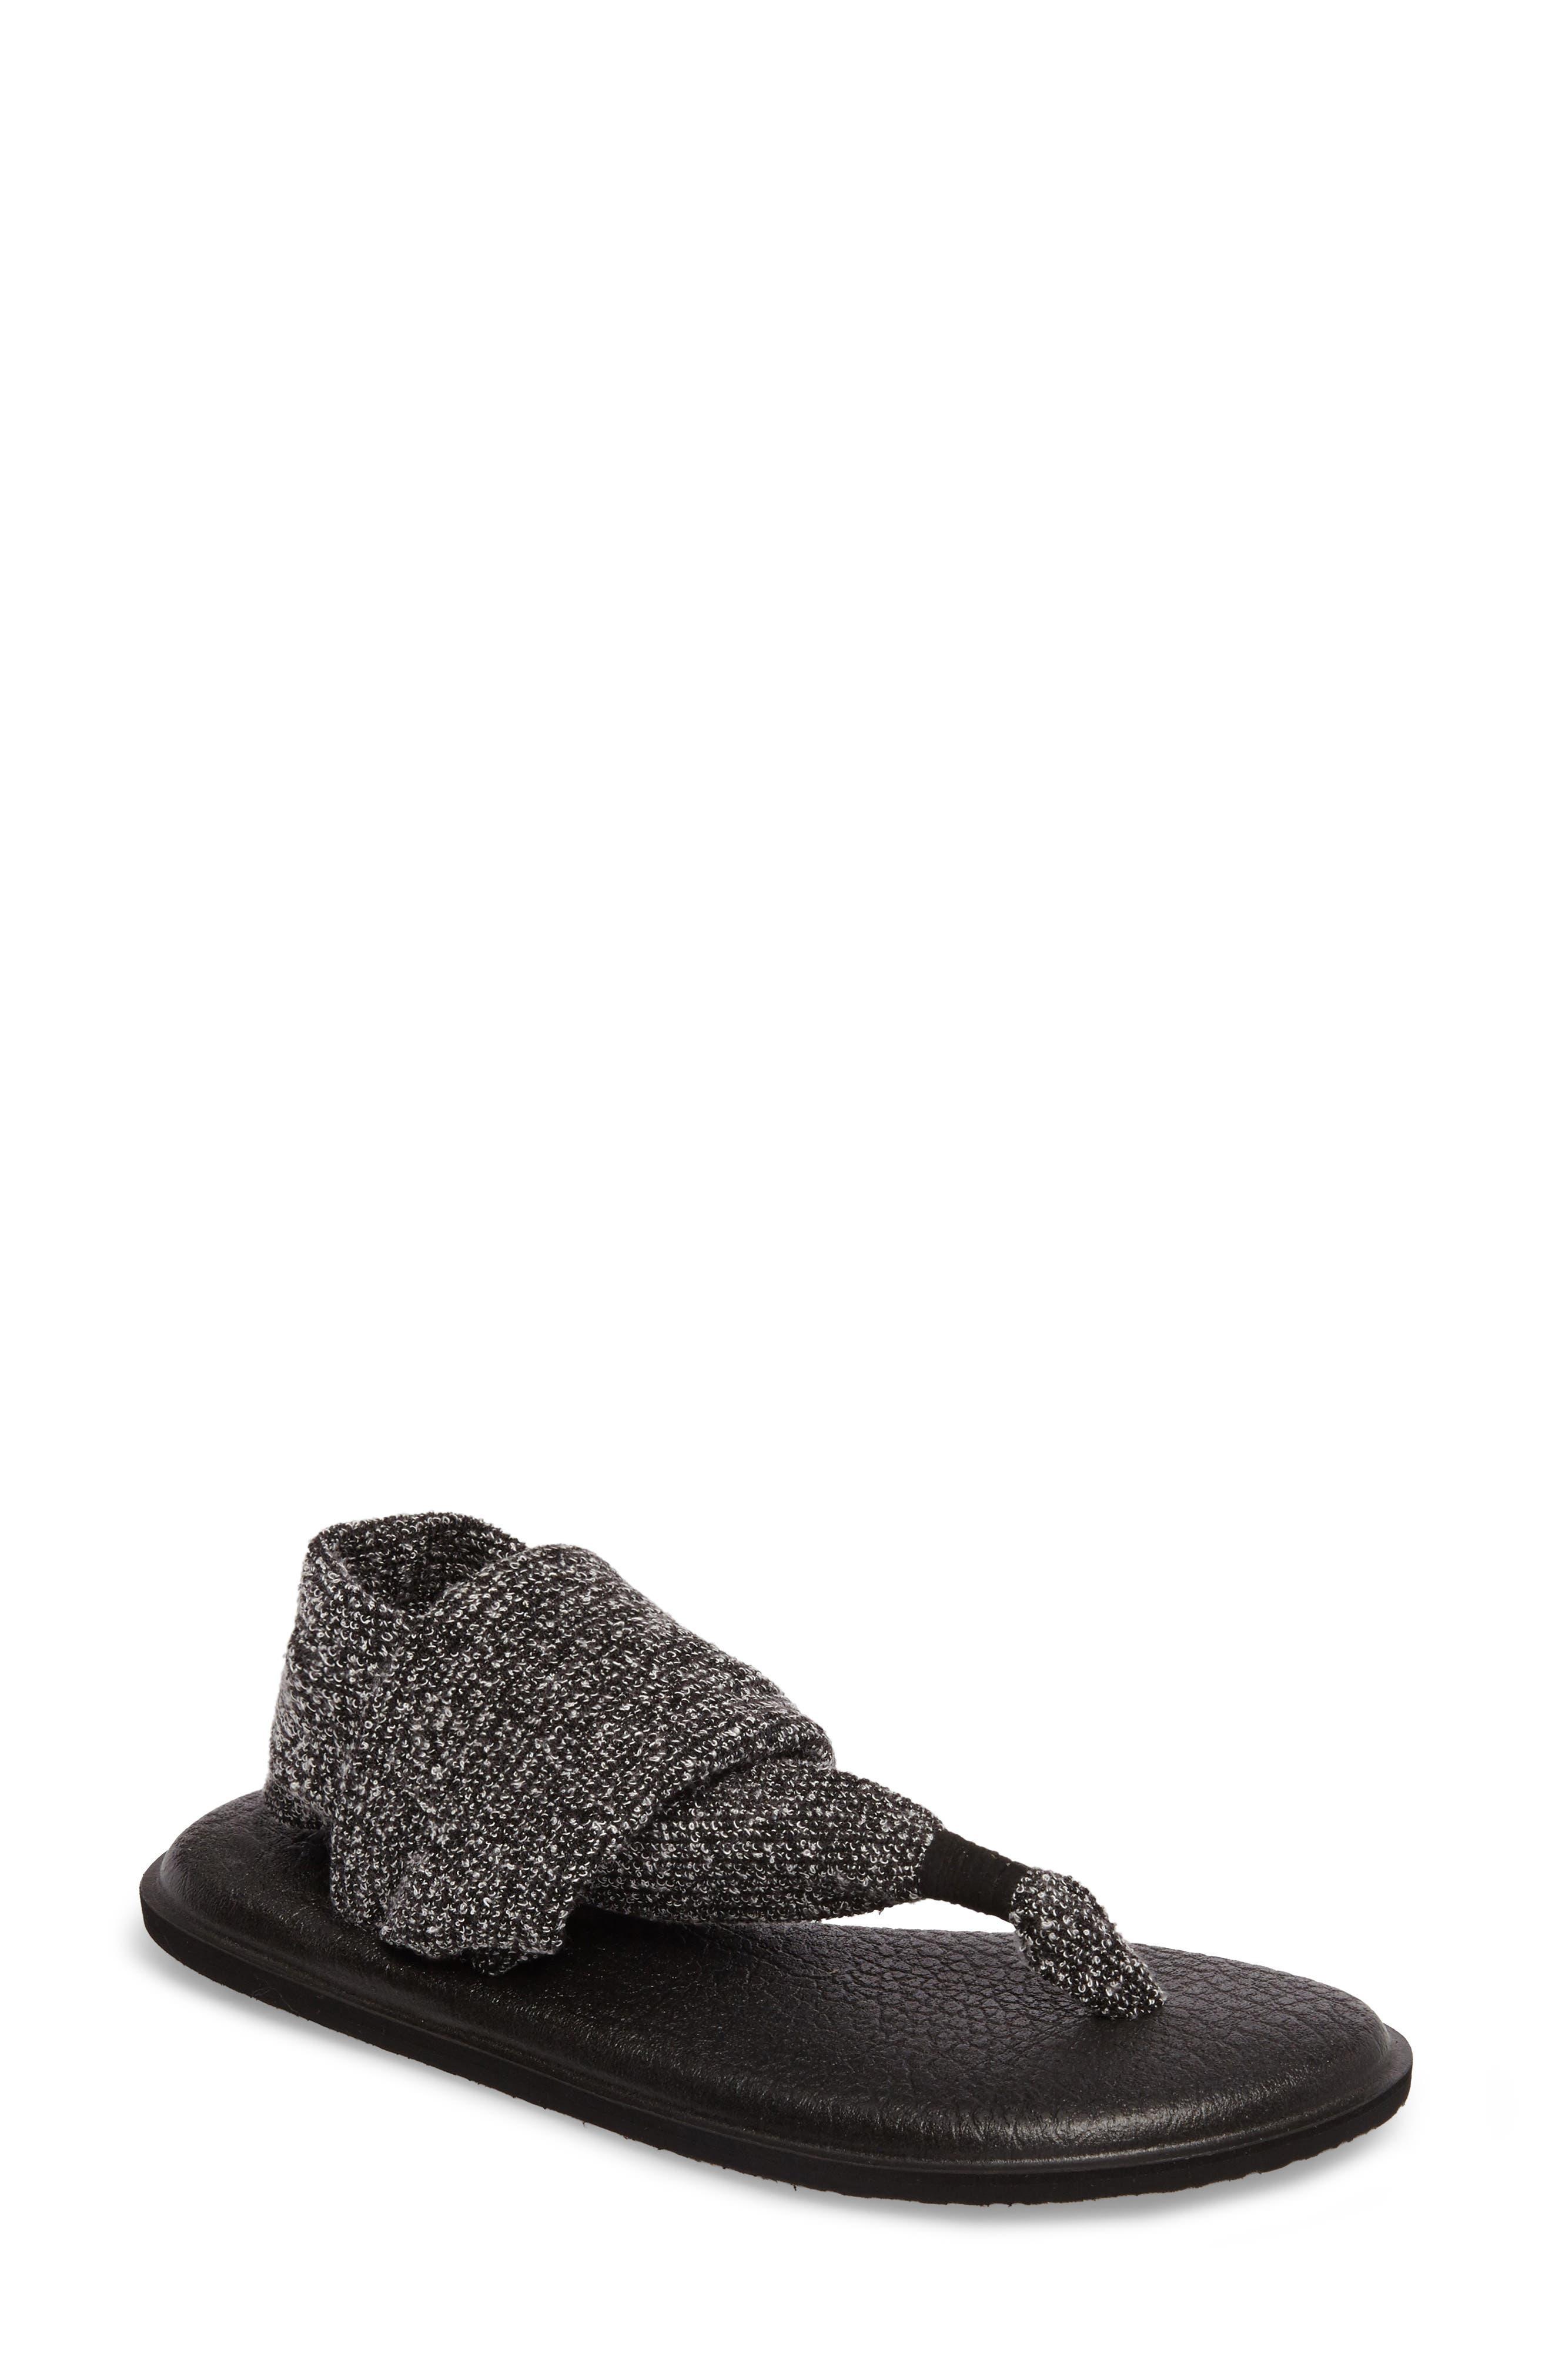 'Yoga Sling 2' Sandal,                         Main,                         color,